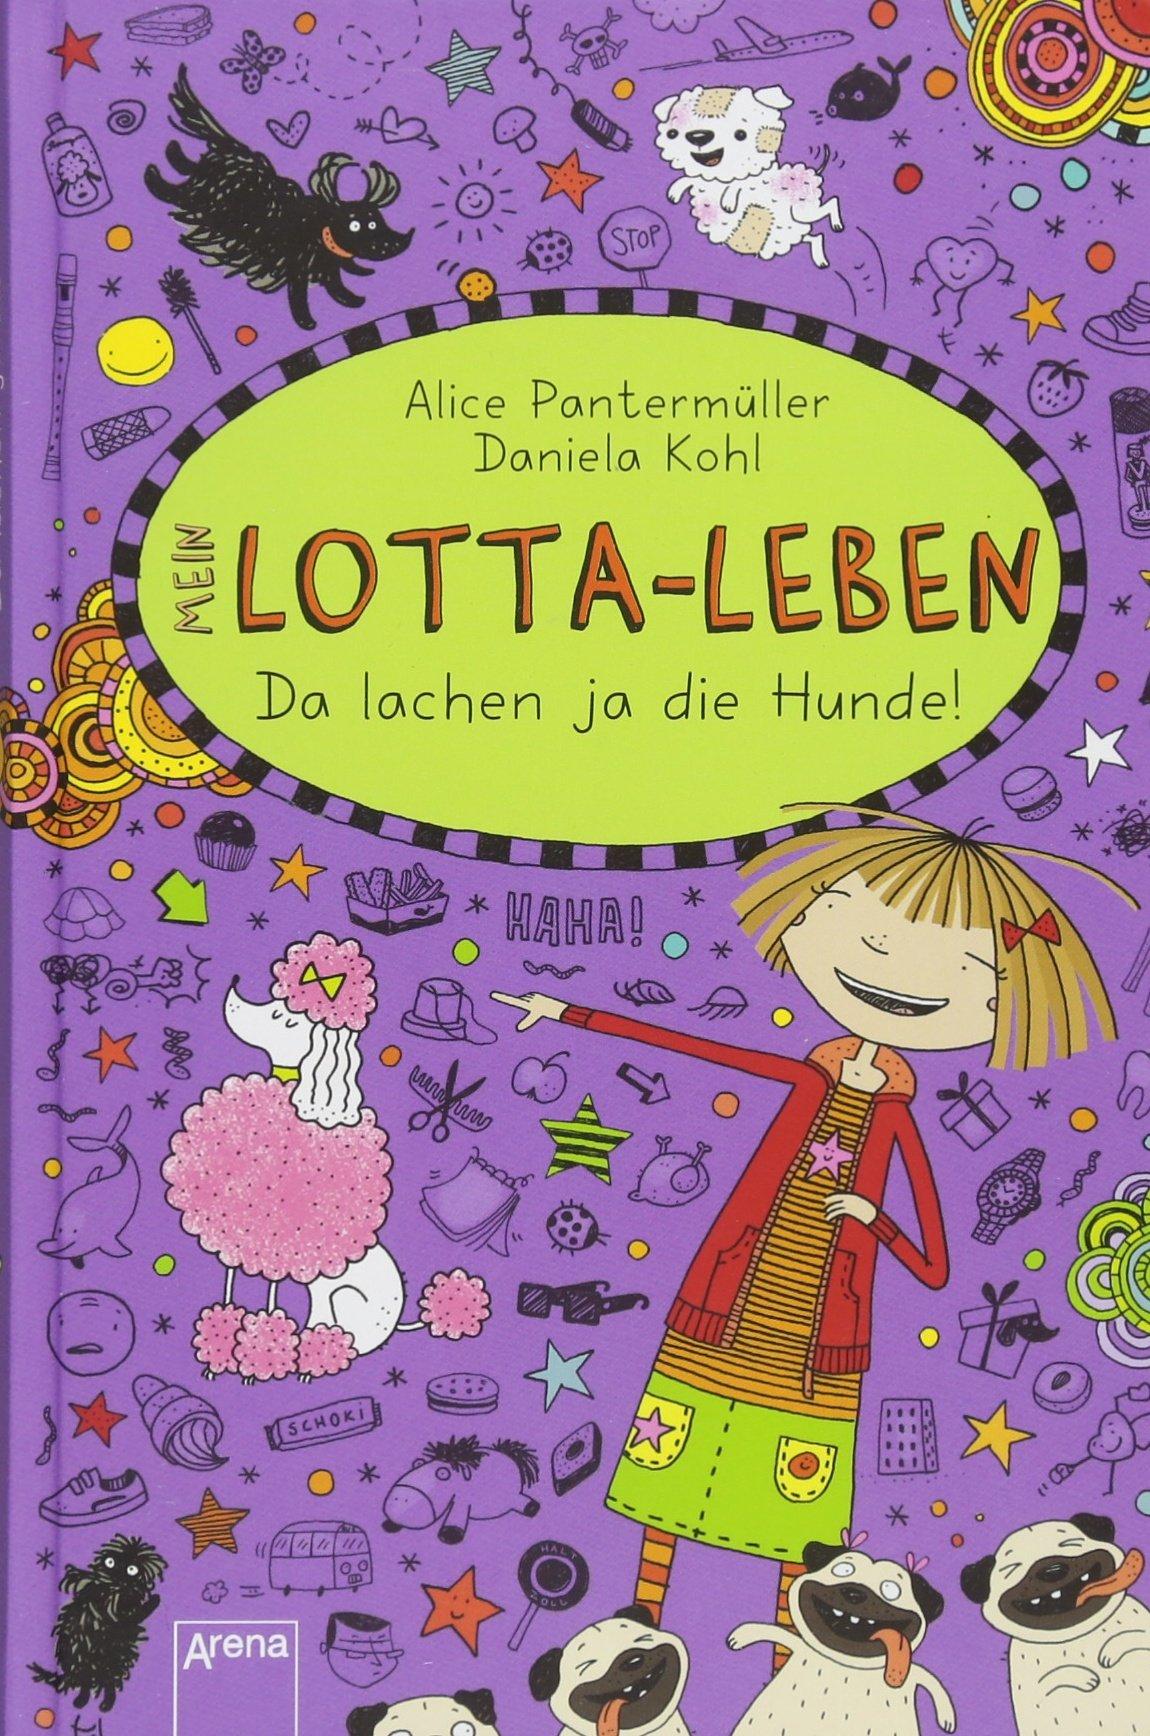 Mein Lotta-Leben (14). Da lachen ja die Hunde: Amazon.de: Alice ...